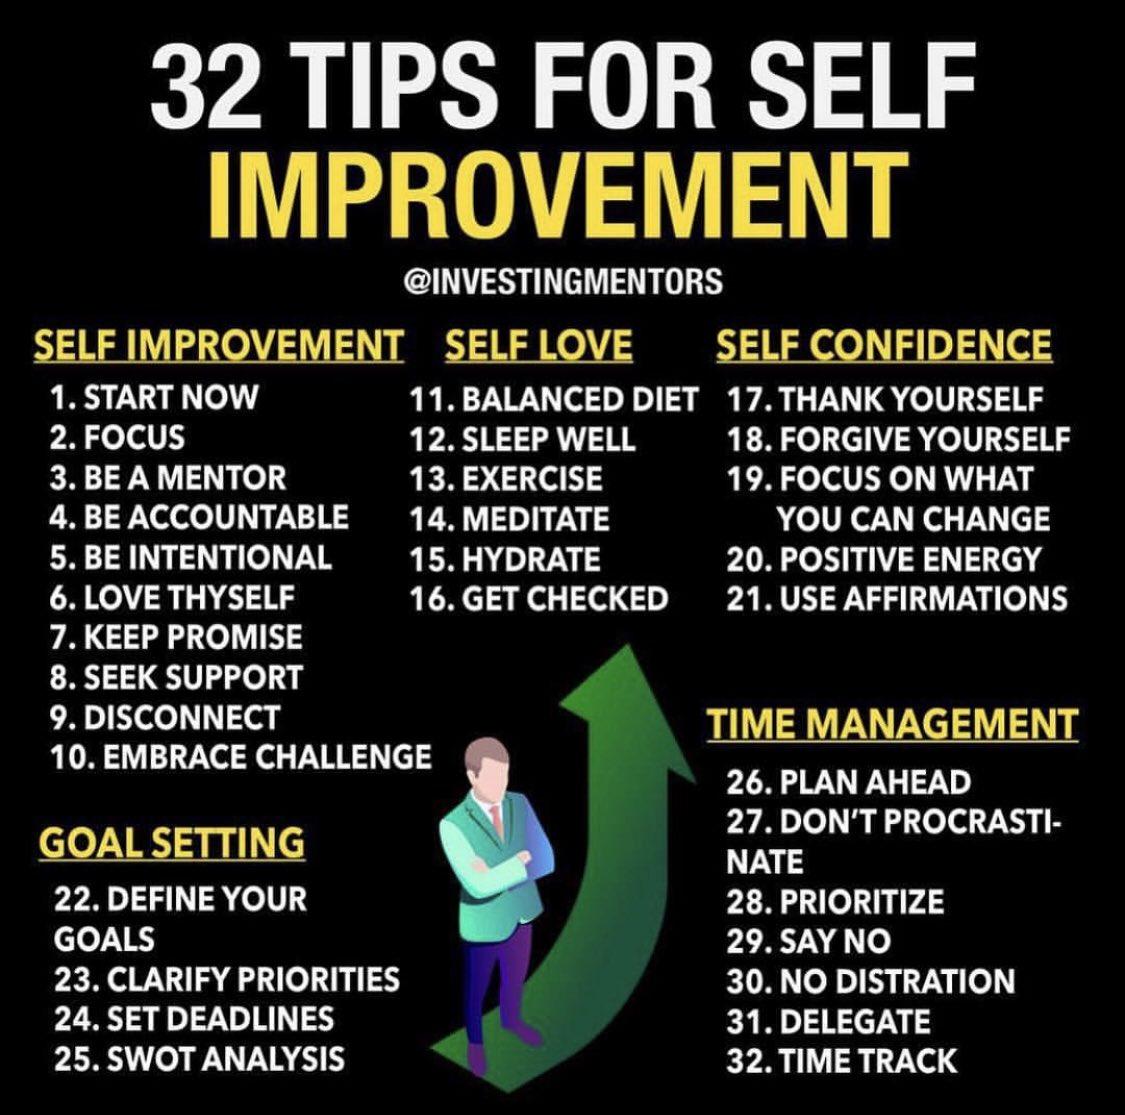 #SelfImprovement